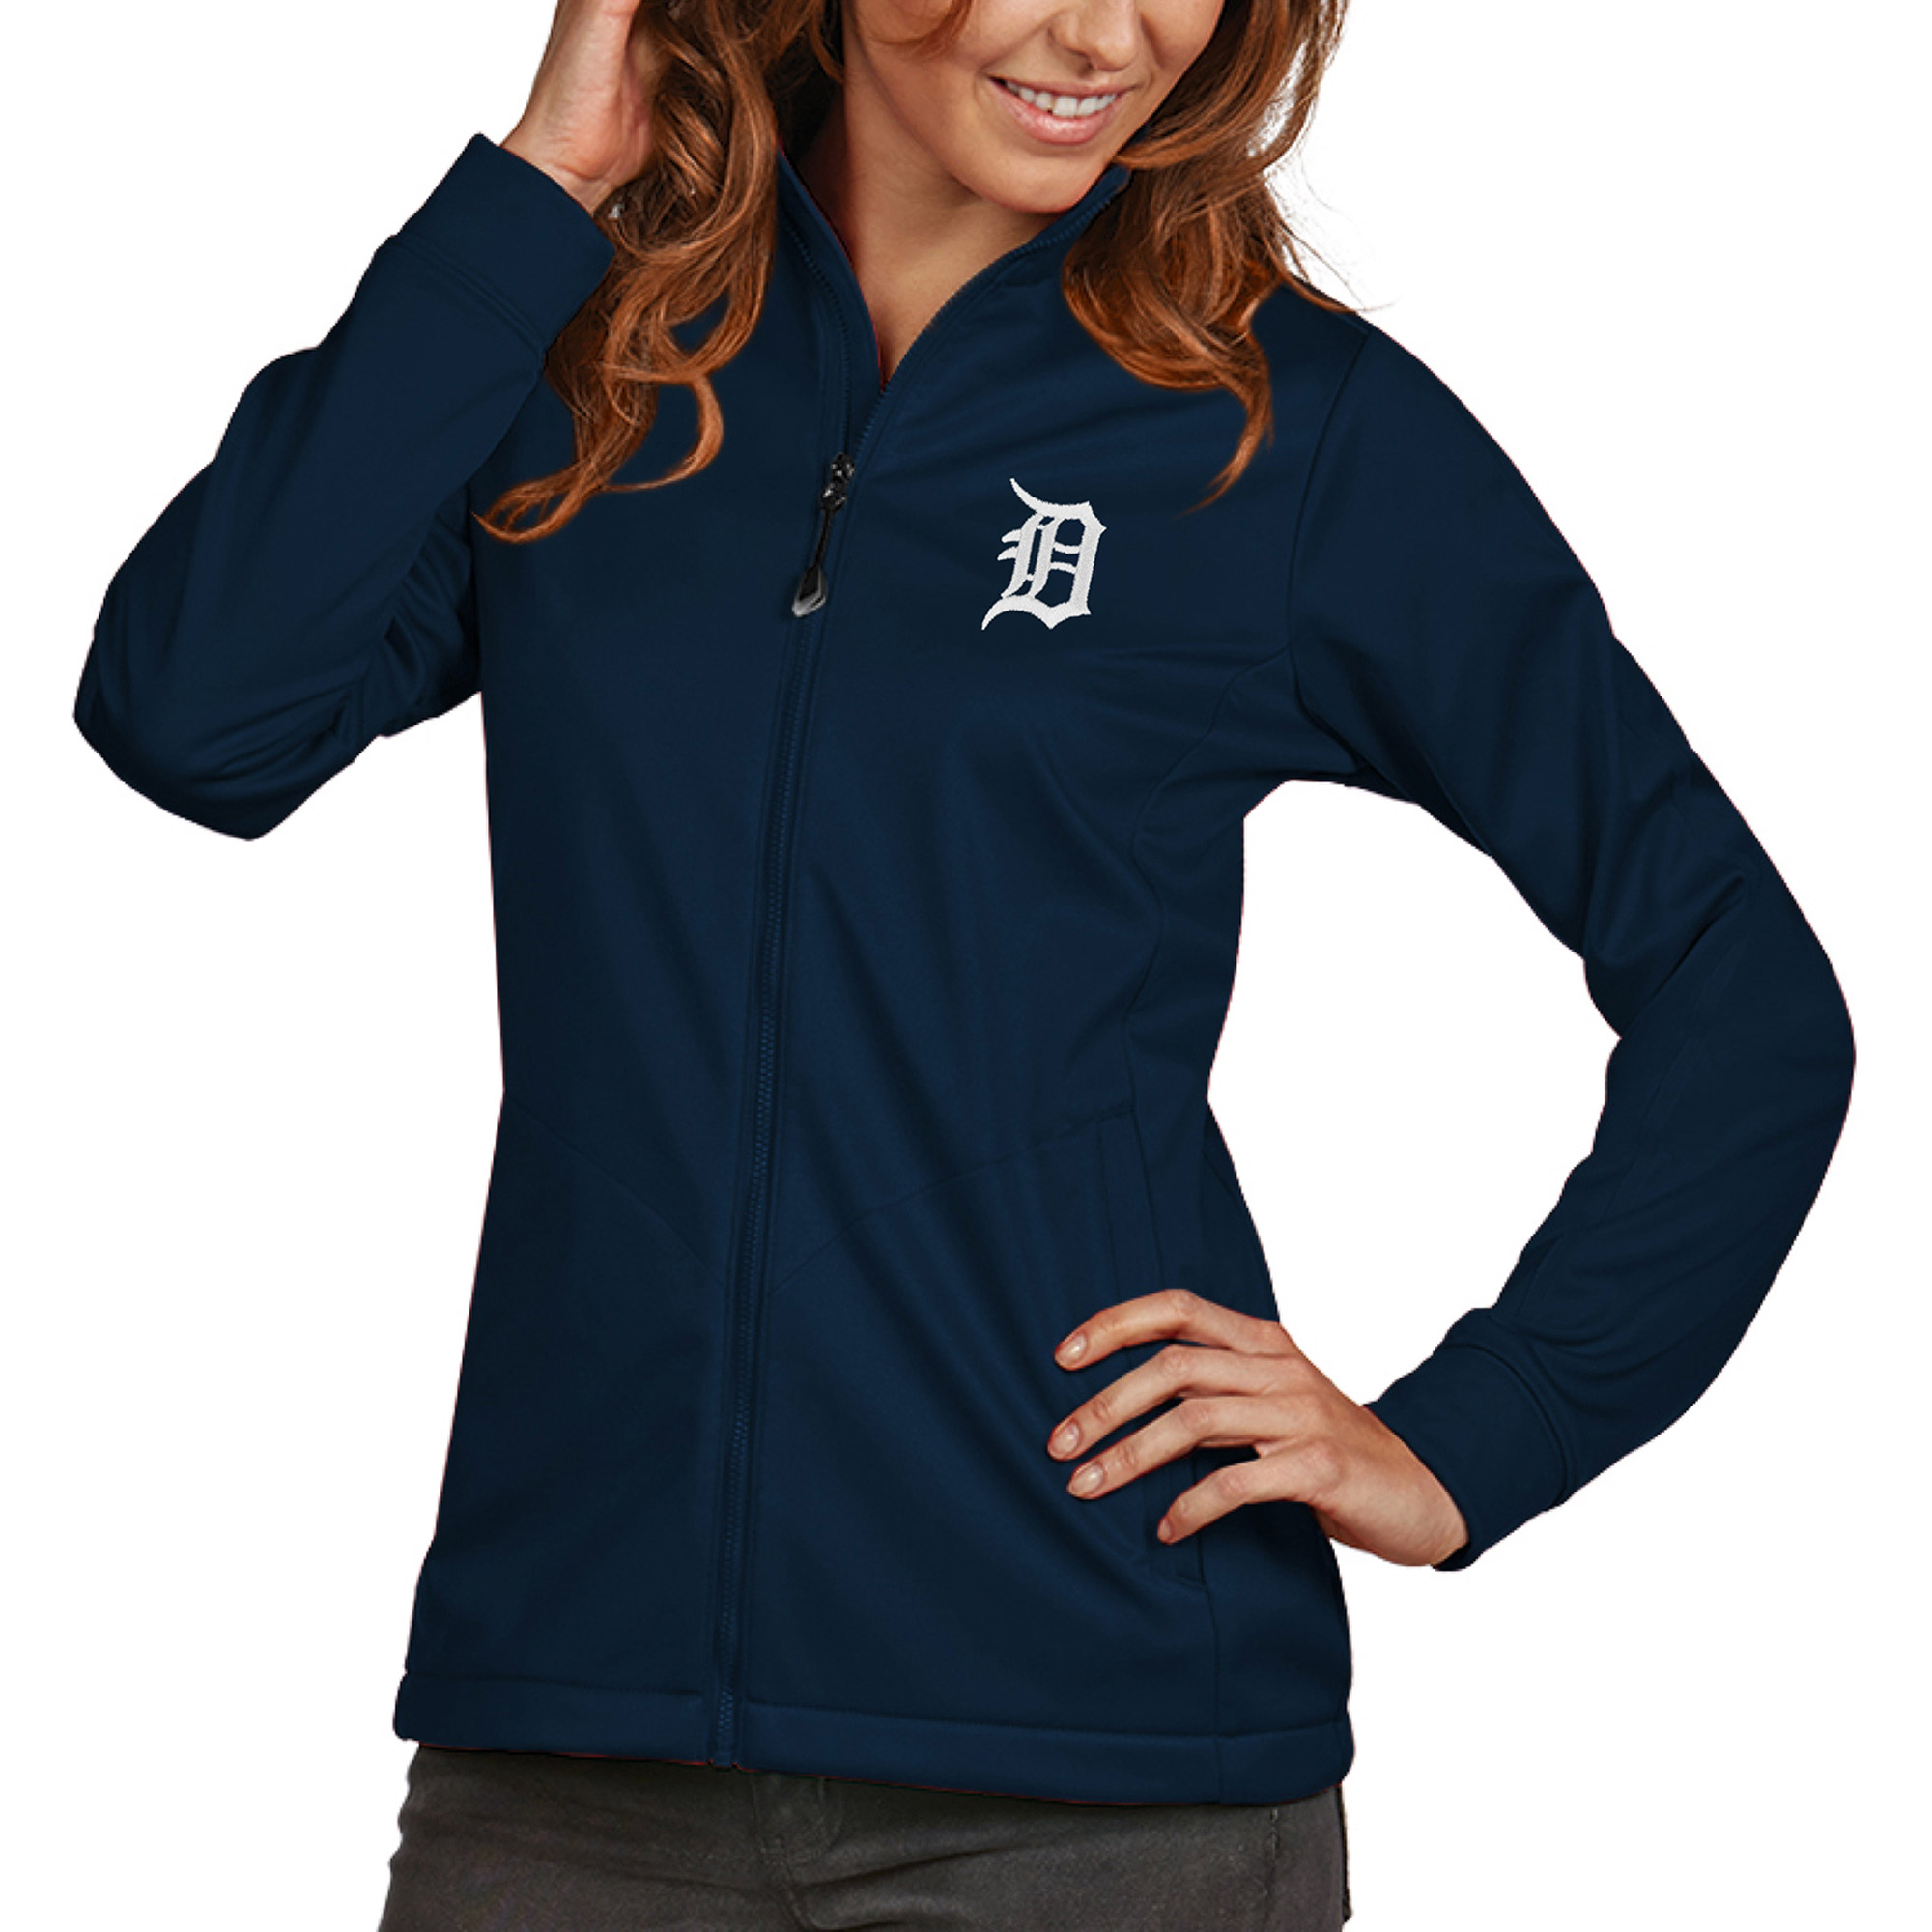 Detroit Tigers Antigua Women's Golf Full-Zip Jacket - Navy